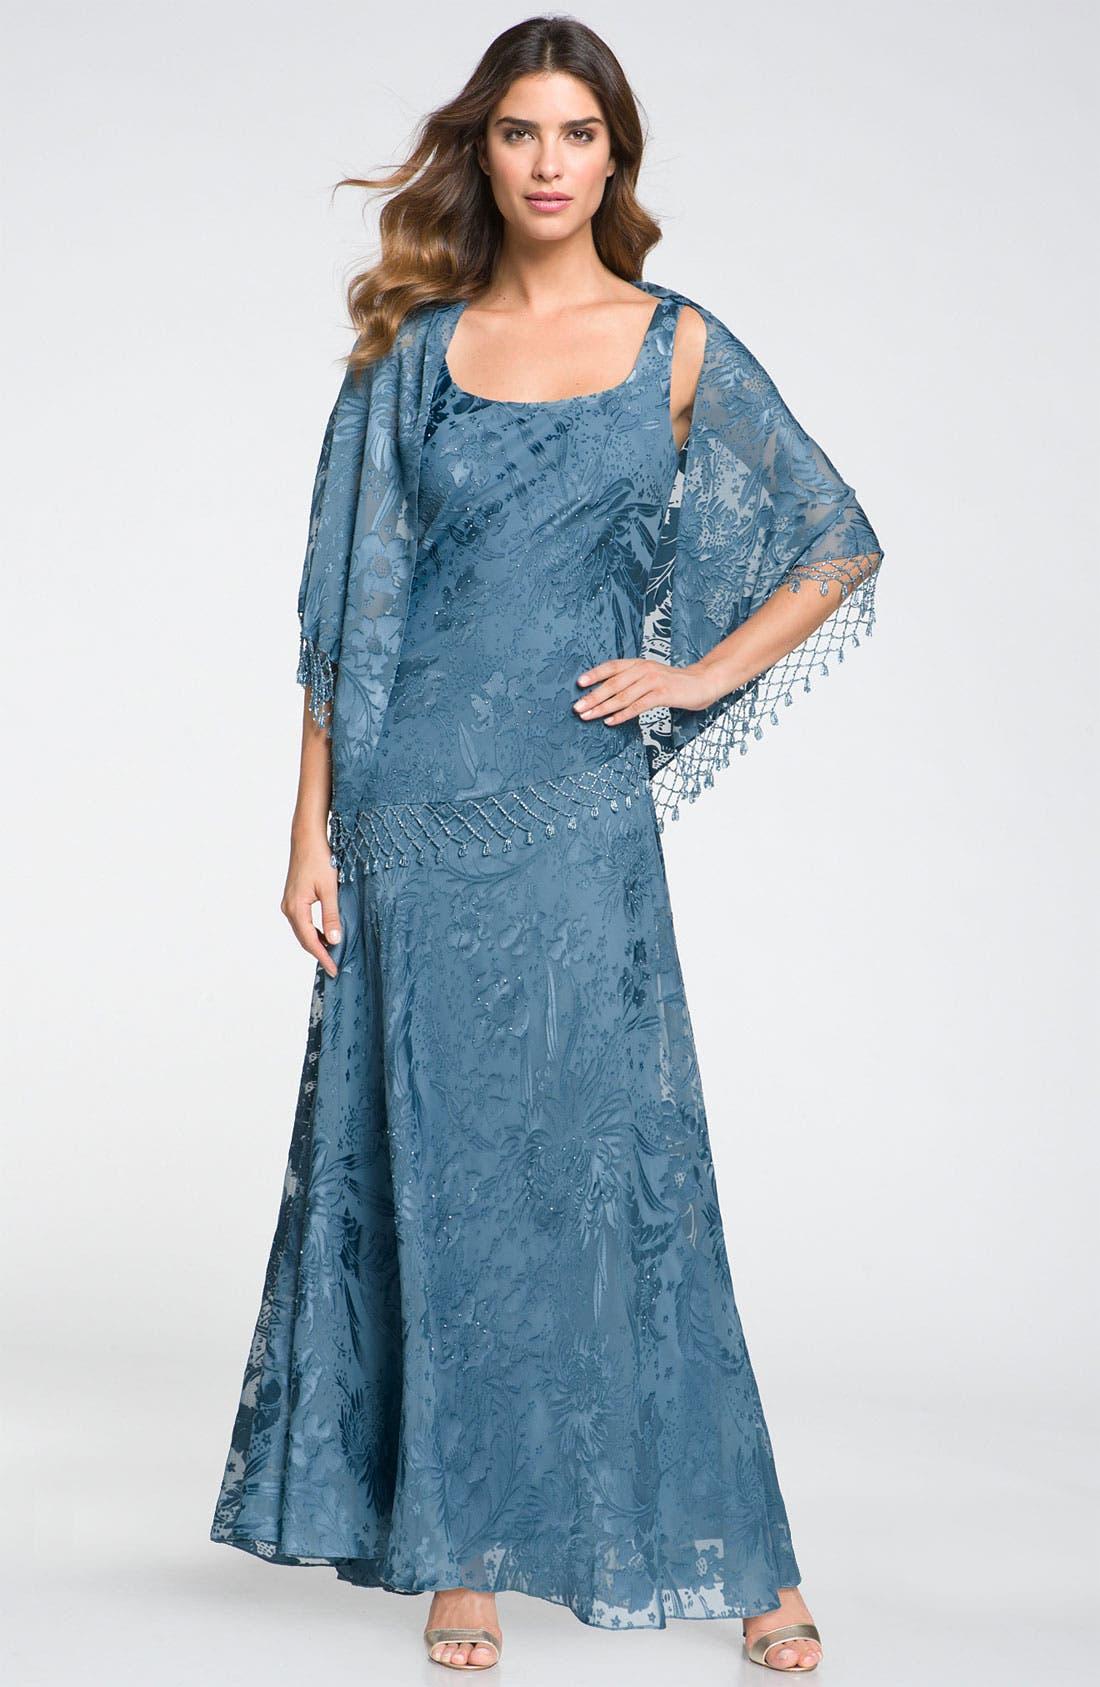 Main Image - Alex Evenings Sequin Lace Overlay Dress & Shawl (Petite)